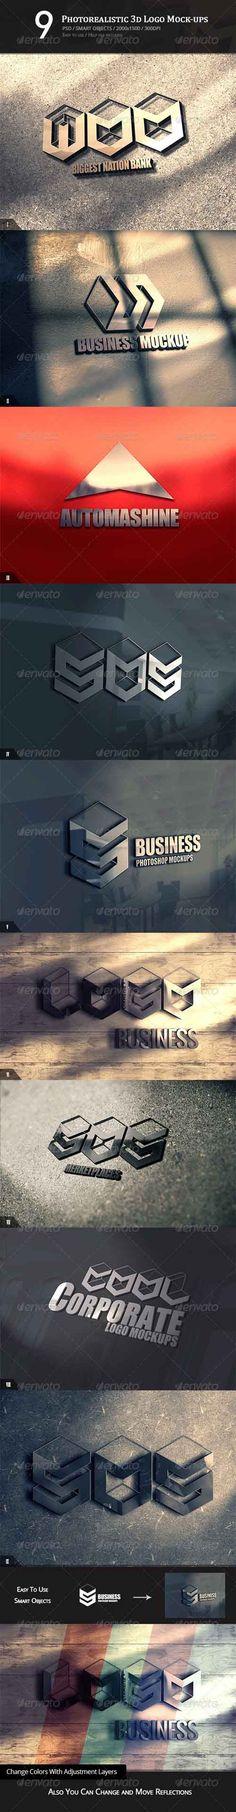 9 Photorealistic 3D Logo Mock-ups PSD » Free Hero Graphic Design: Vectors AEP Projects PSD Sources Web Templates – HeroGFX.com